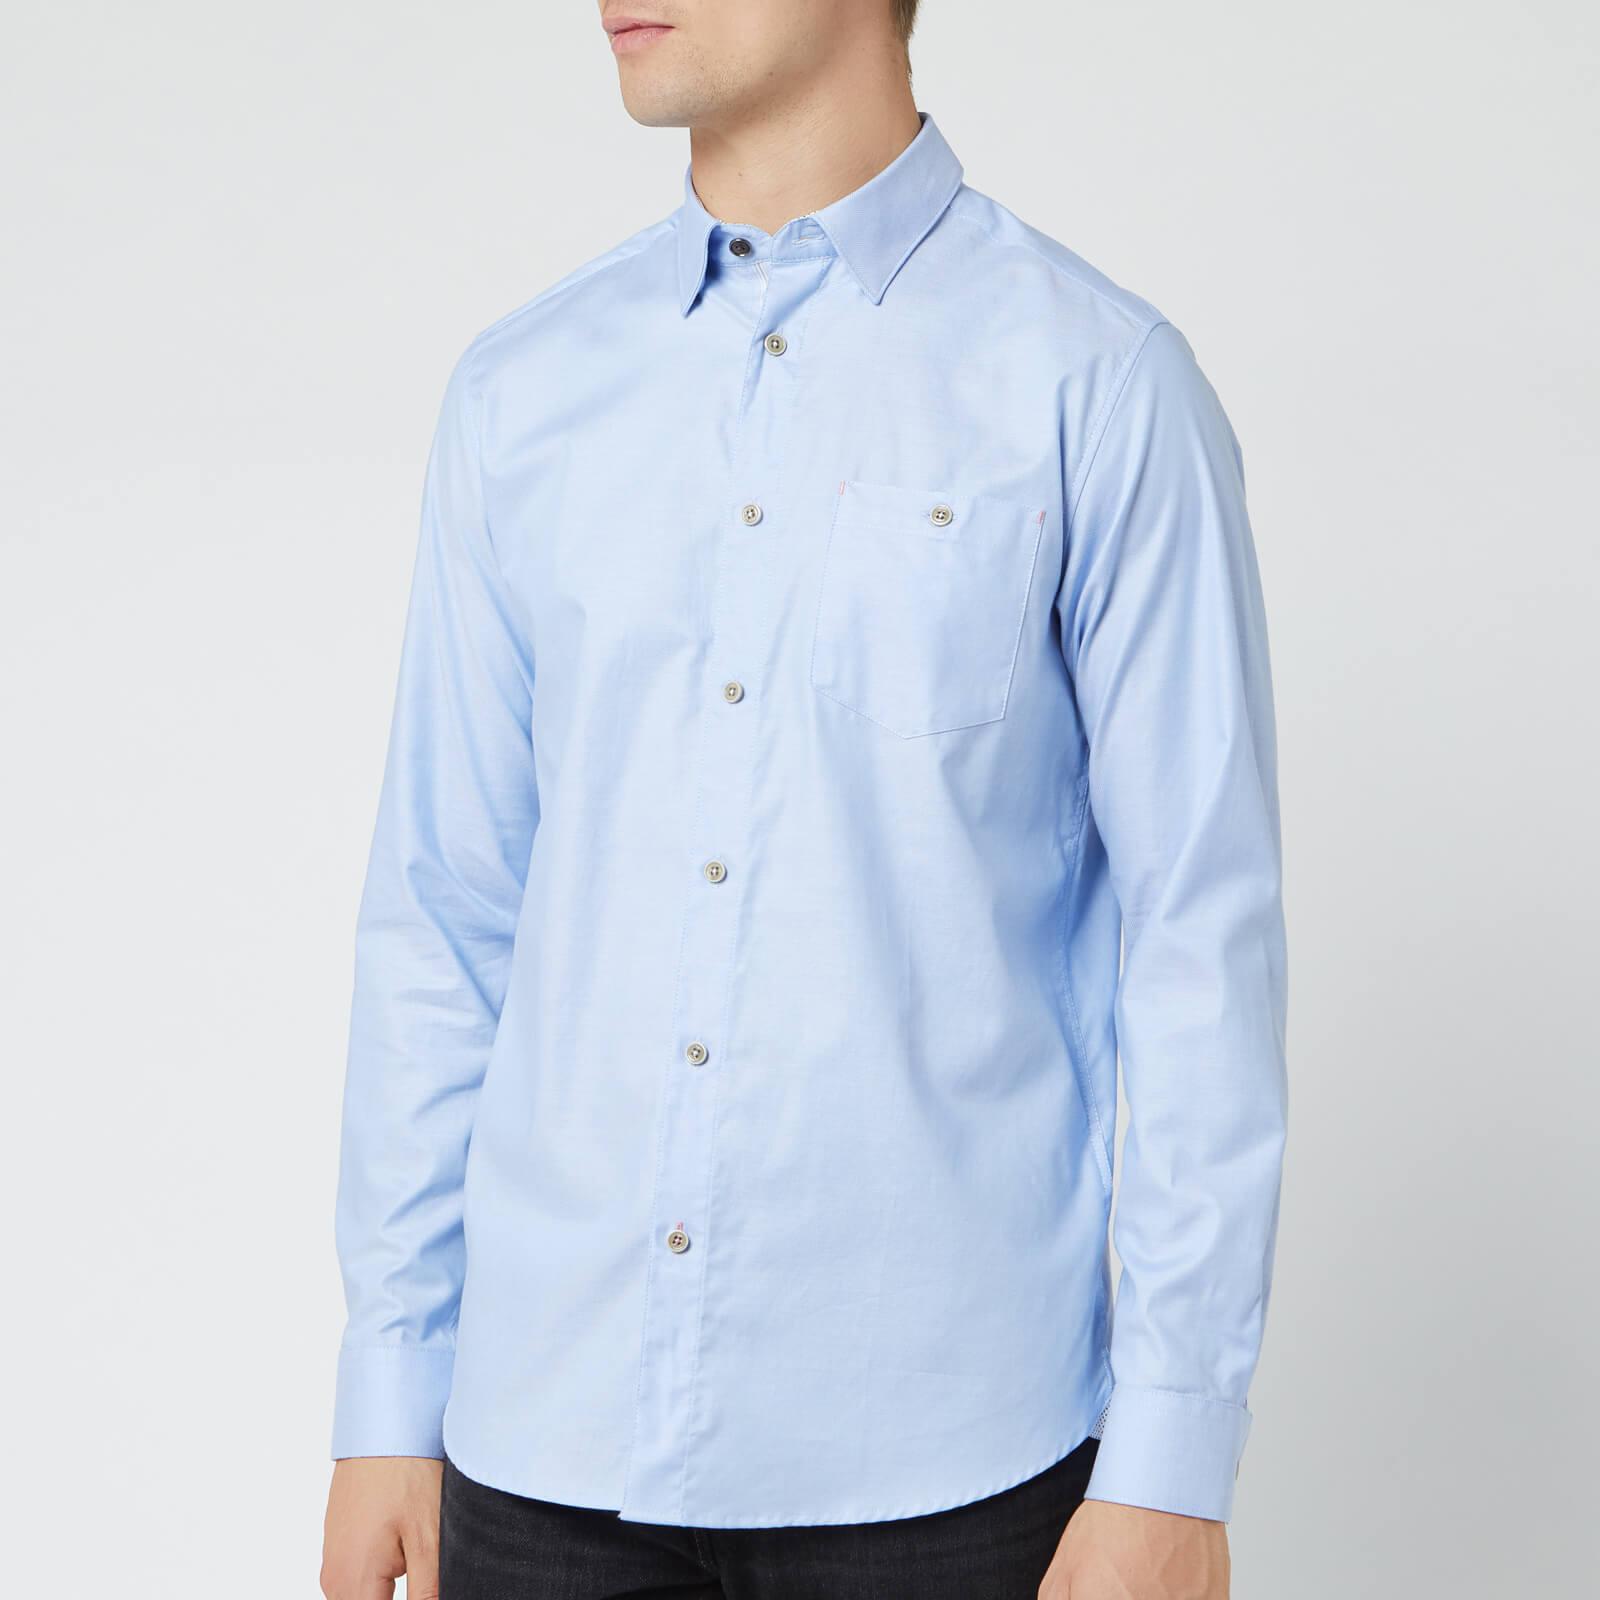 Ted Baker Men's Zachari Long Sleeve Shirt - Light Blue - L/4